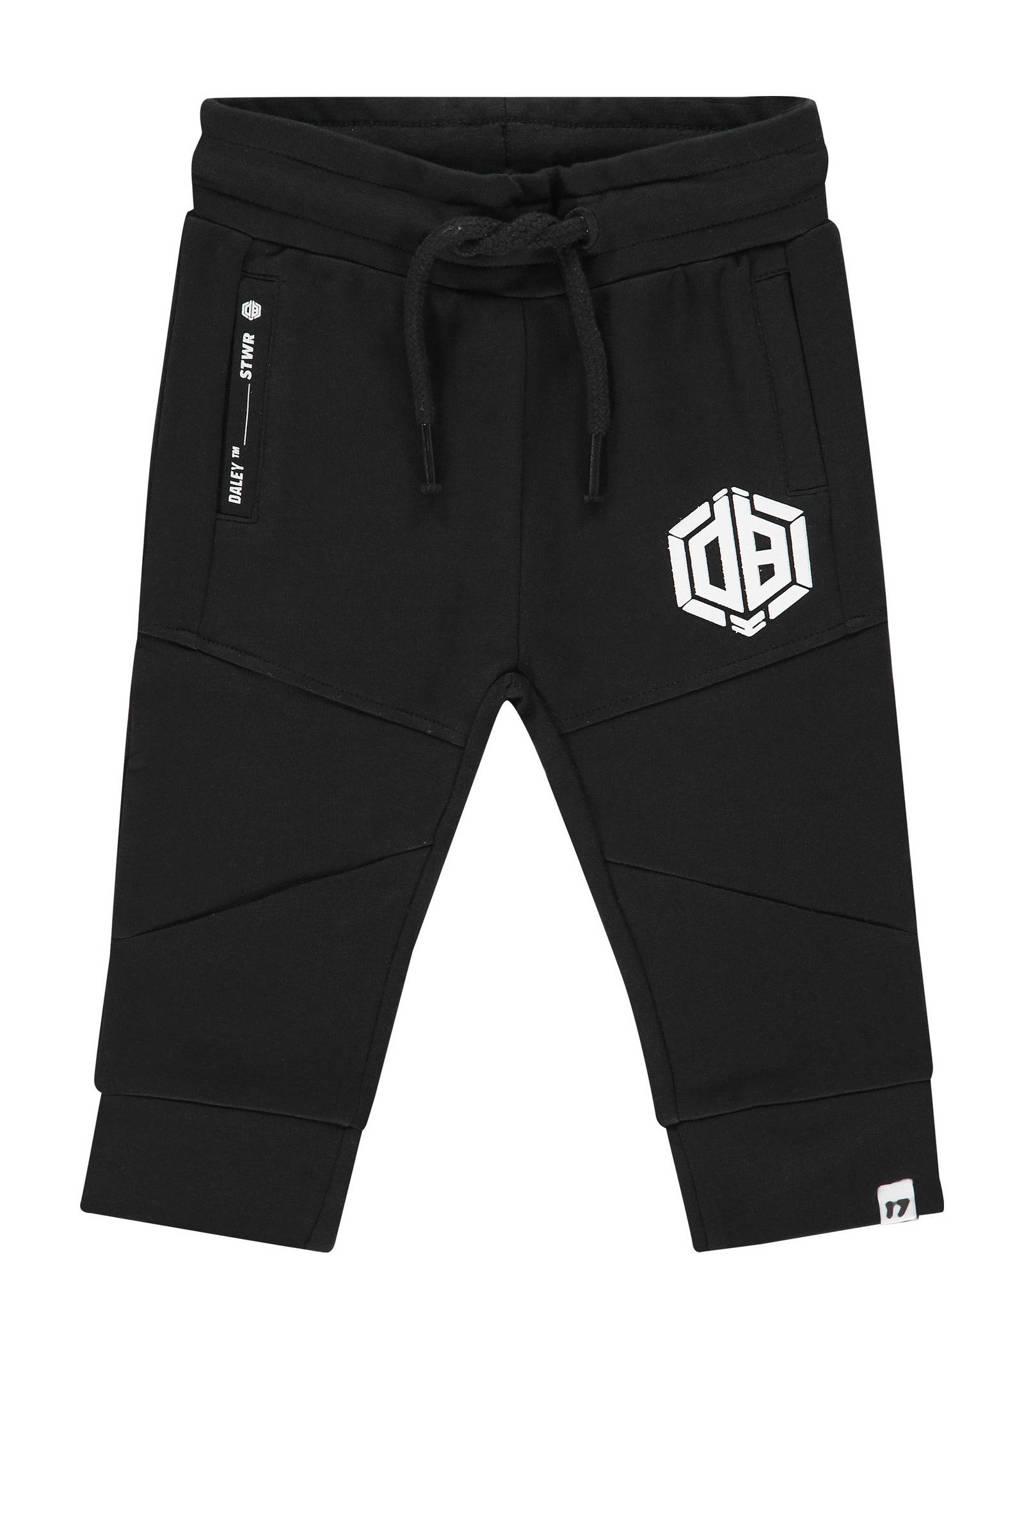 Vingino Daley Blind tapered fit joggingbroek Sode mini met logo zwart, Zwart